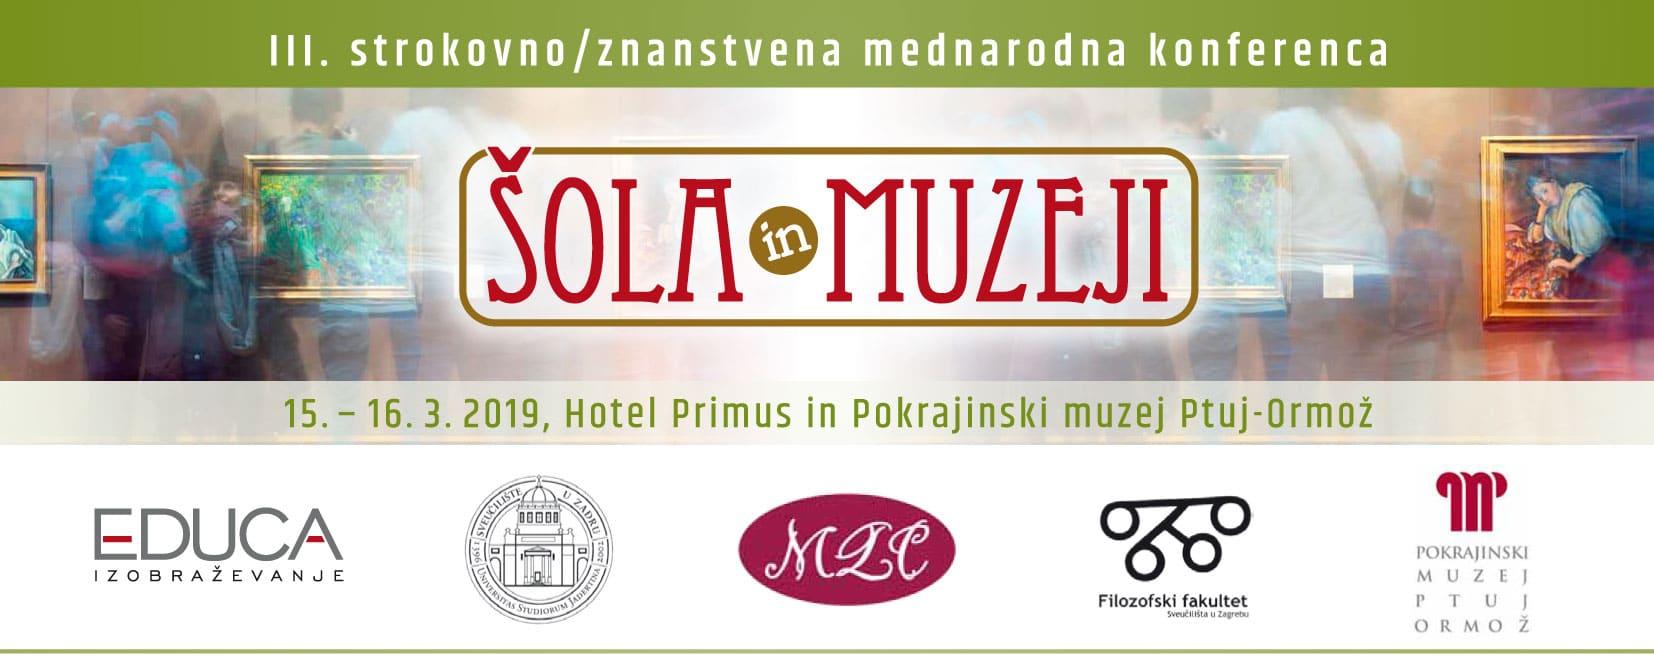 Šola in muzeji Ptuj 2019